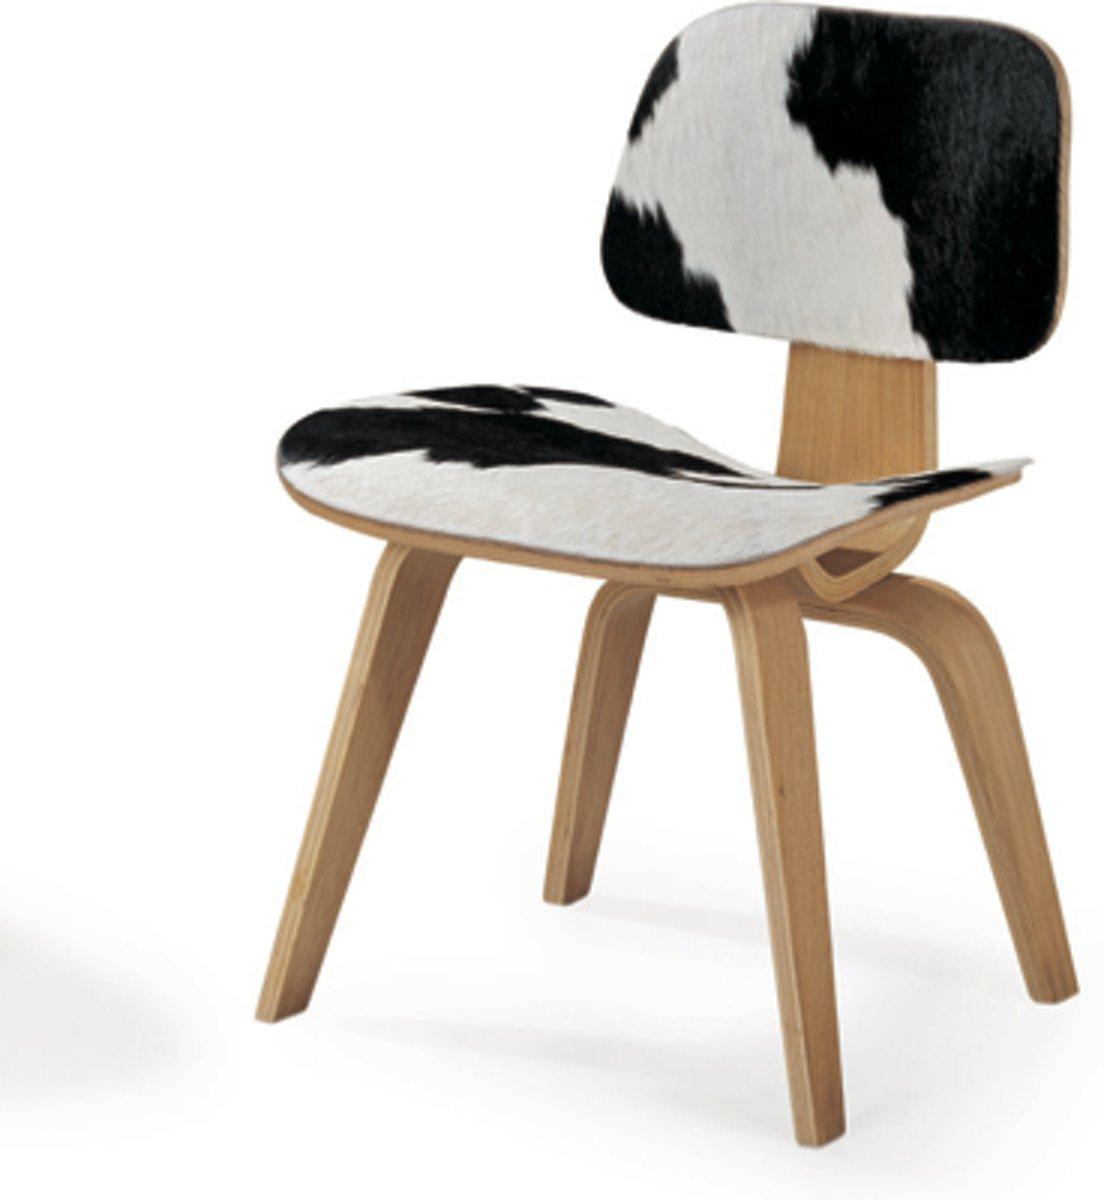 lounge stoel LCW pony-huid Pony Skin Zwart Wit, eiken gekleurde houten frame kopen